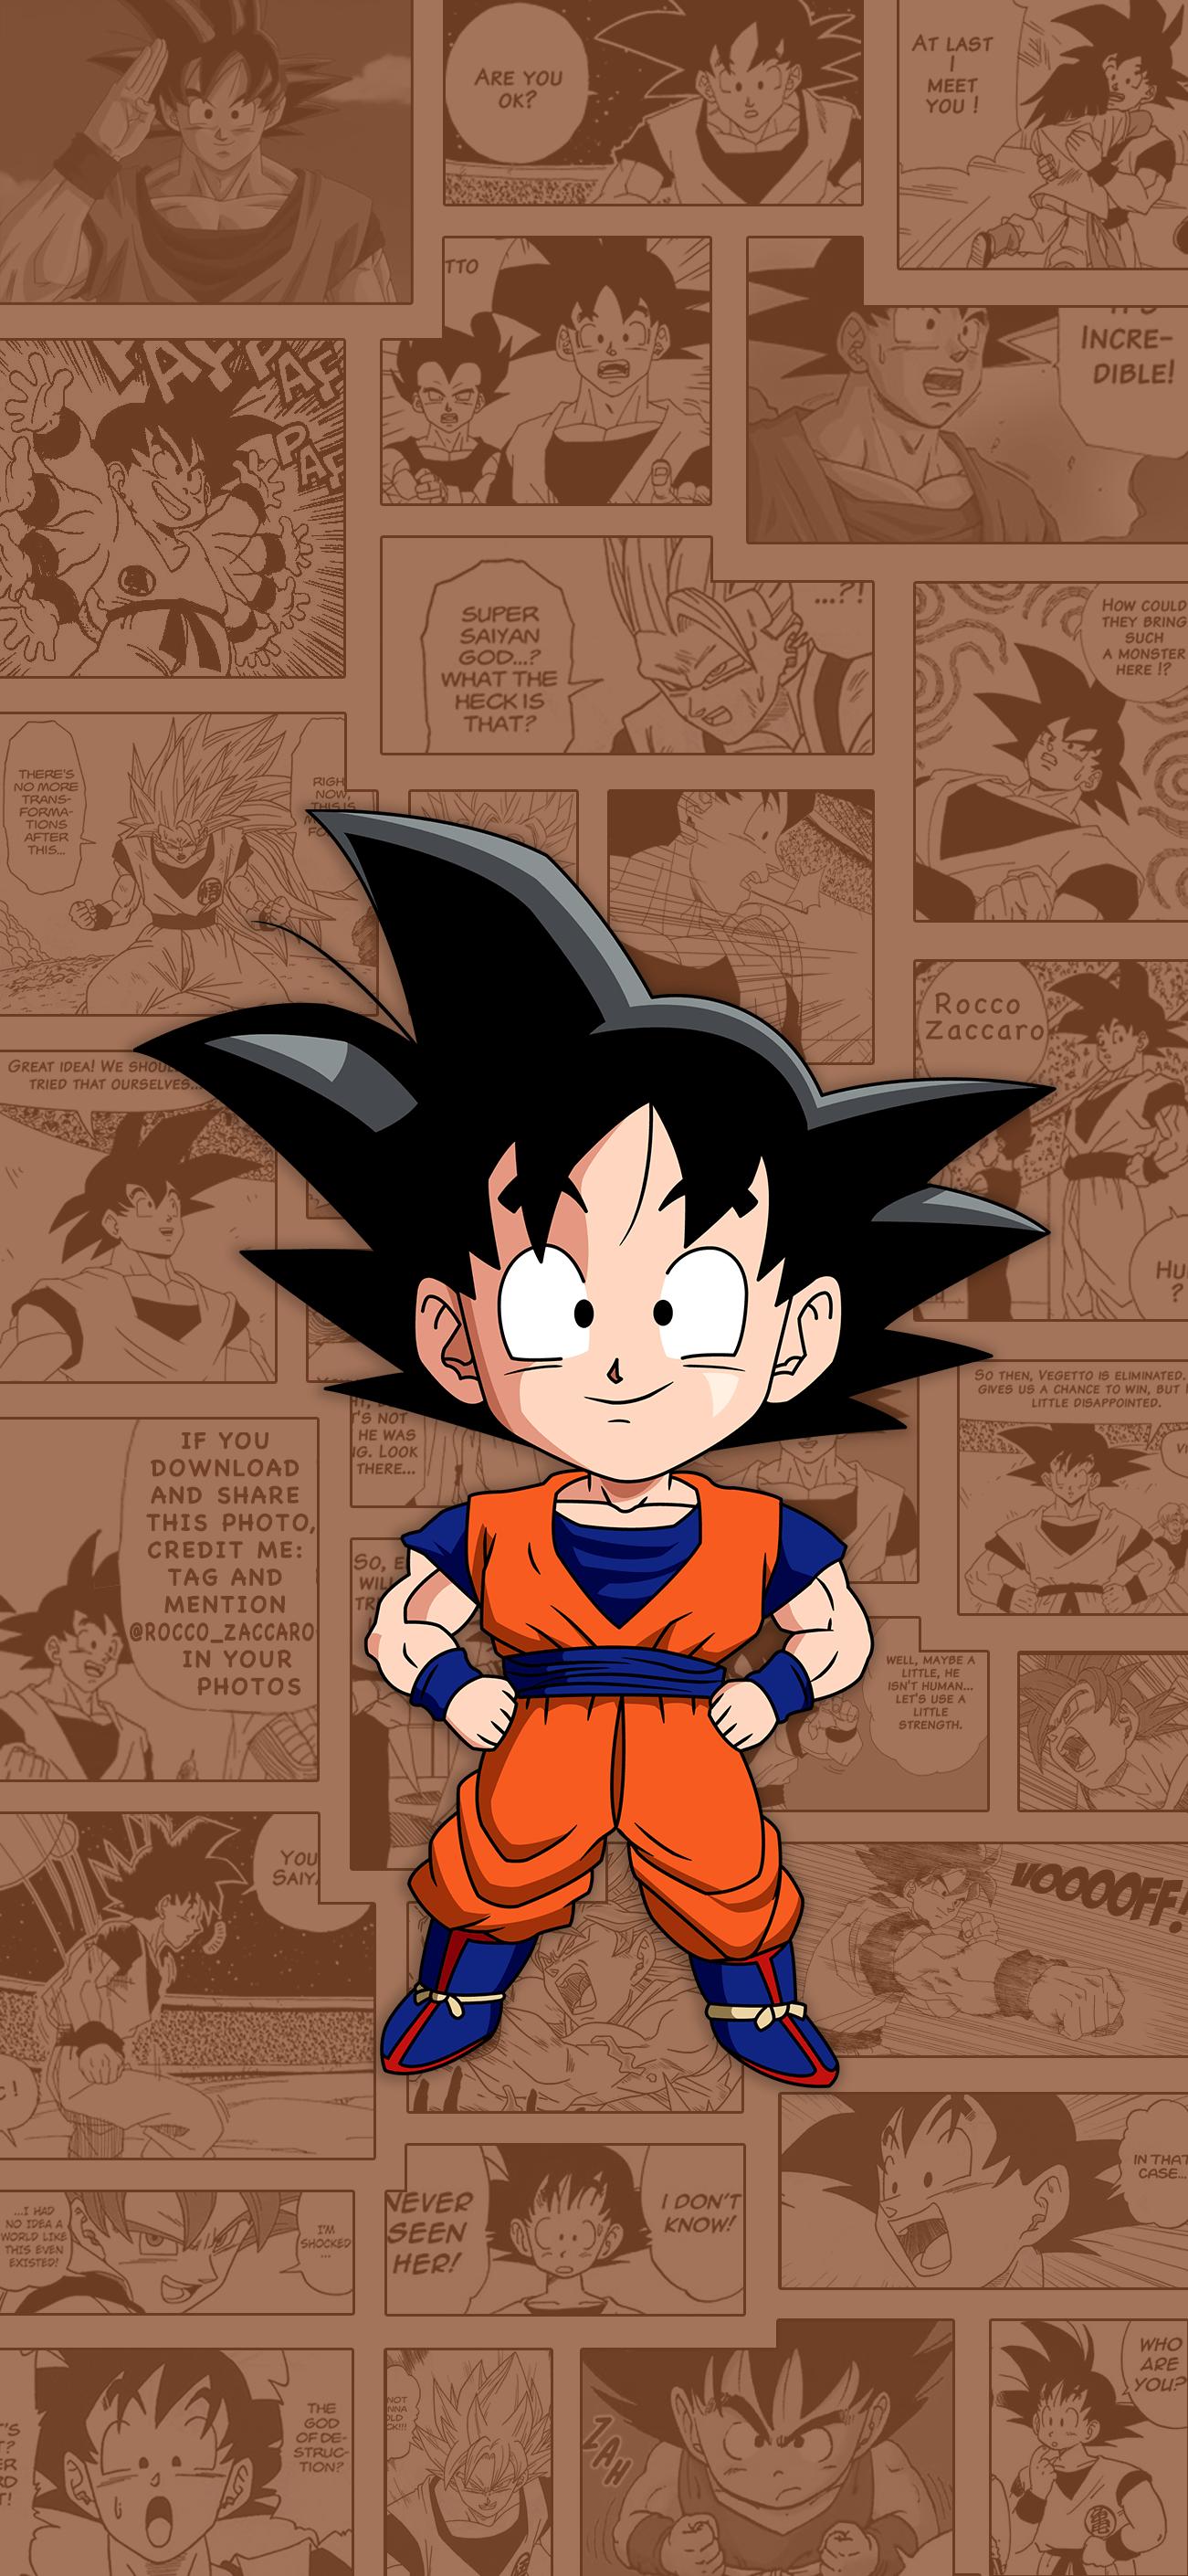 Son Goku Wallpapers Top Free Son Goku Backgrounds